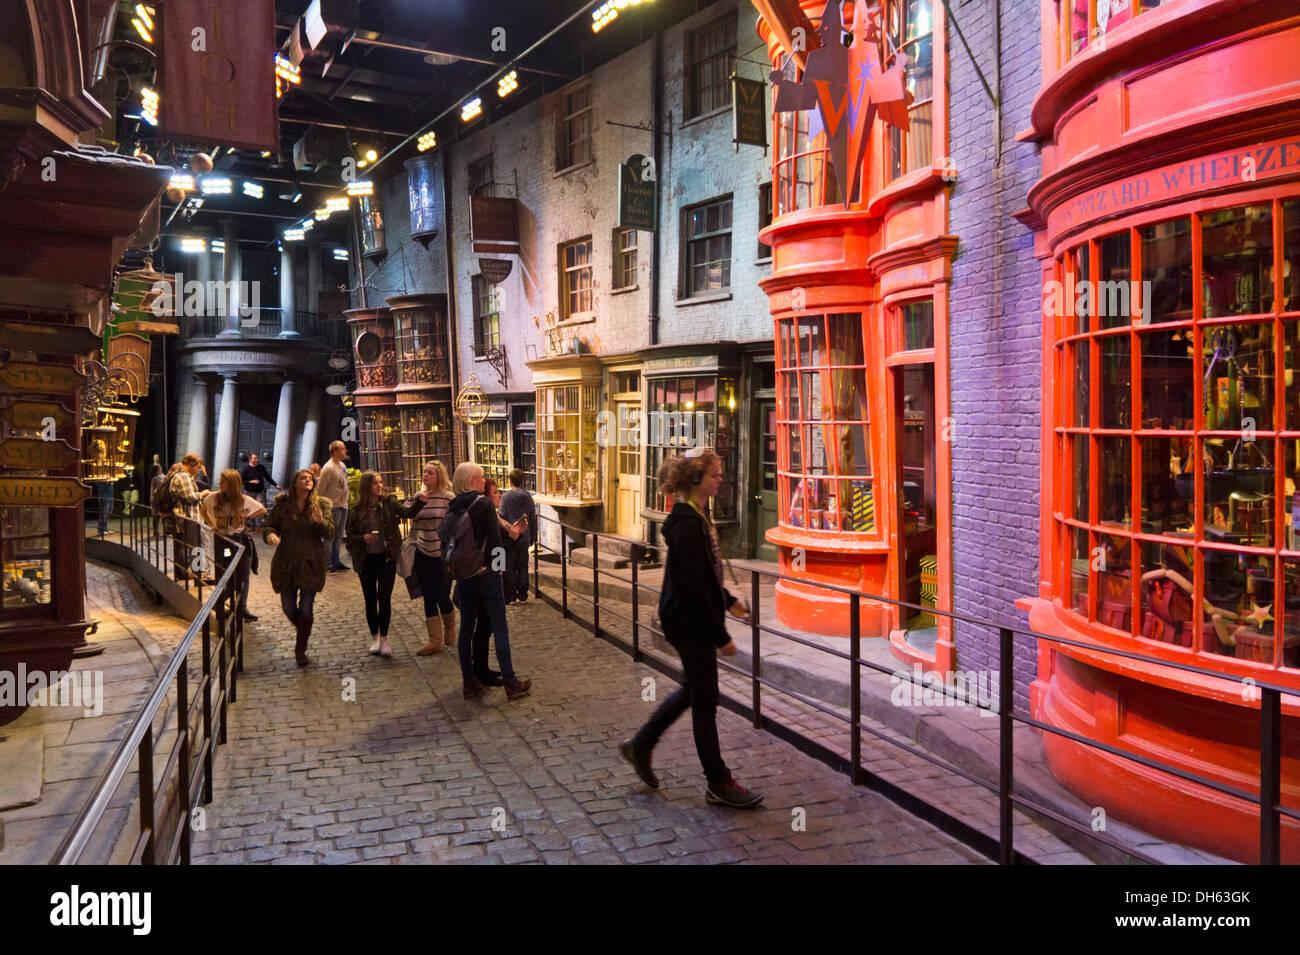 Interior scenes at Diagon Alley at the Harry Potter World Warner Bros Studio Tour Leavesden Watford London UK GB - Stock Image